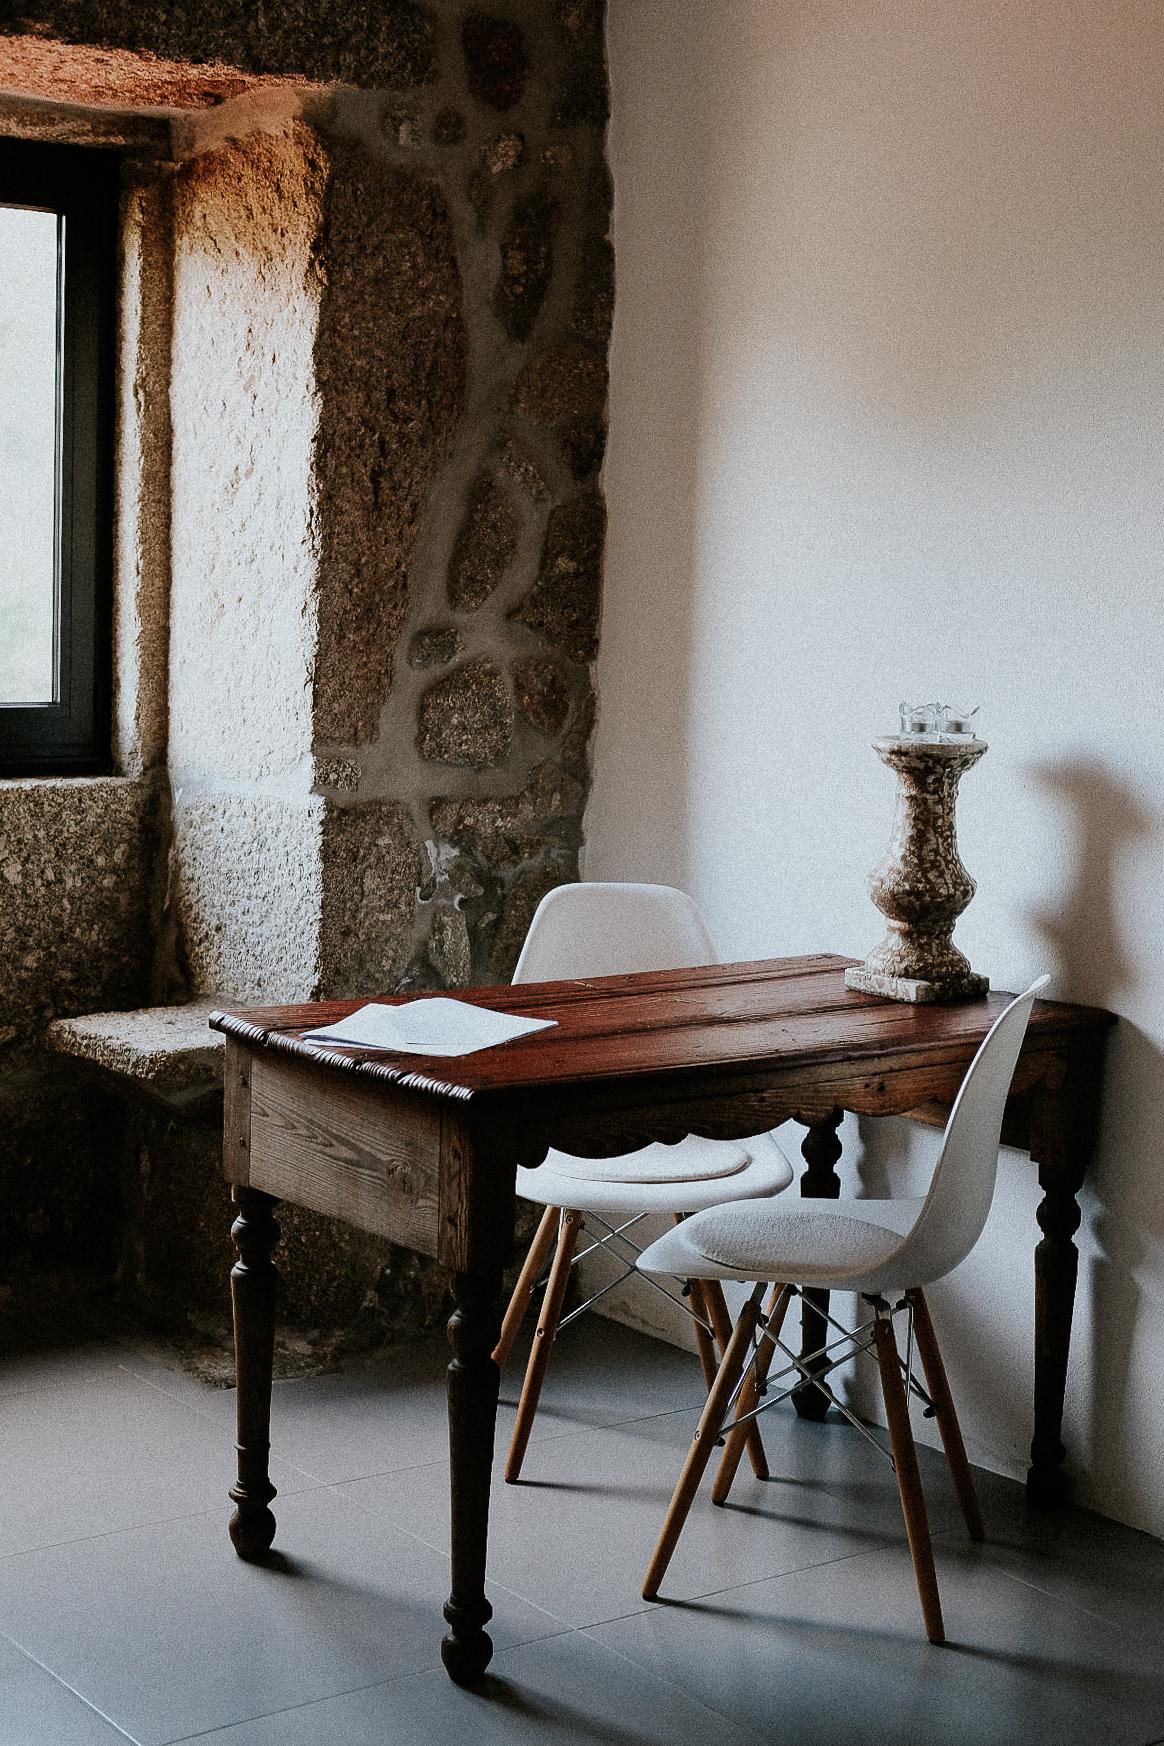 quinta olivia airbnb opinion